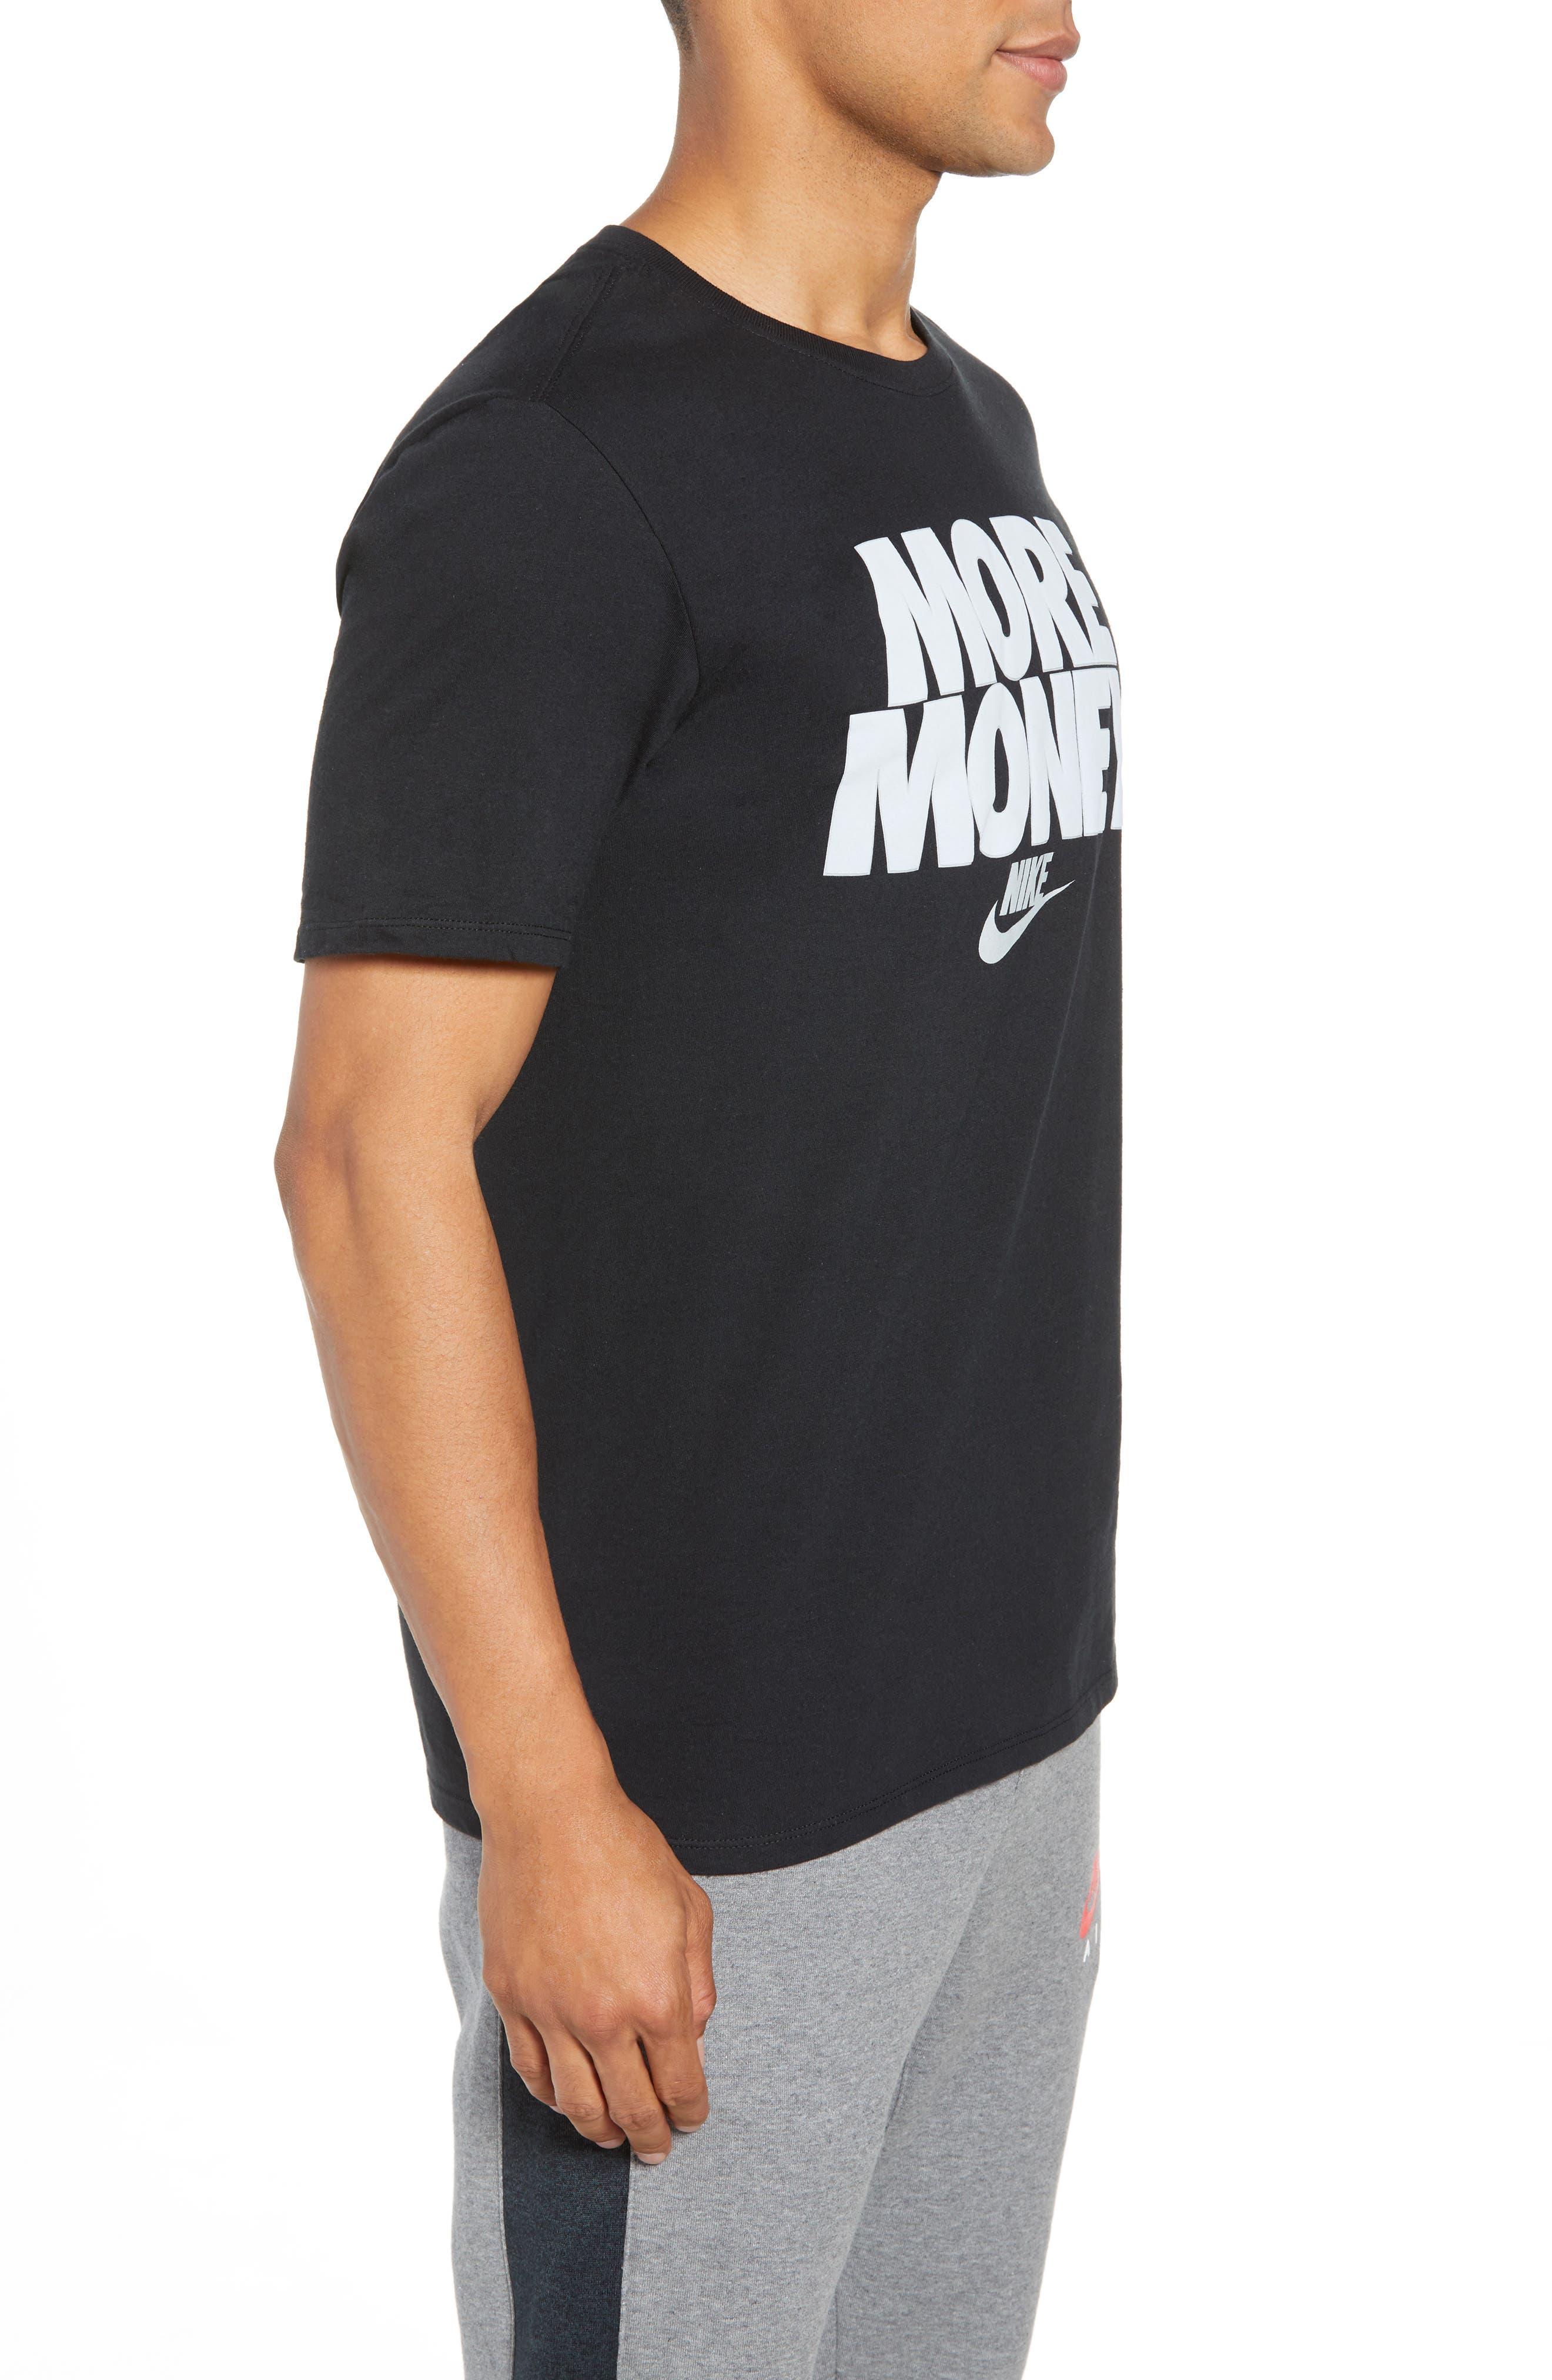 Sportswear More Money T-Shirt,                             Alternate thumbnail 3, color,                             Black/ Metallic Silver